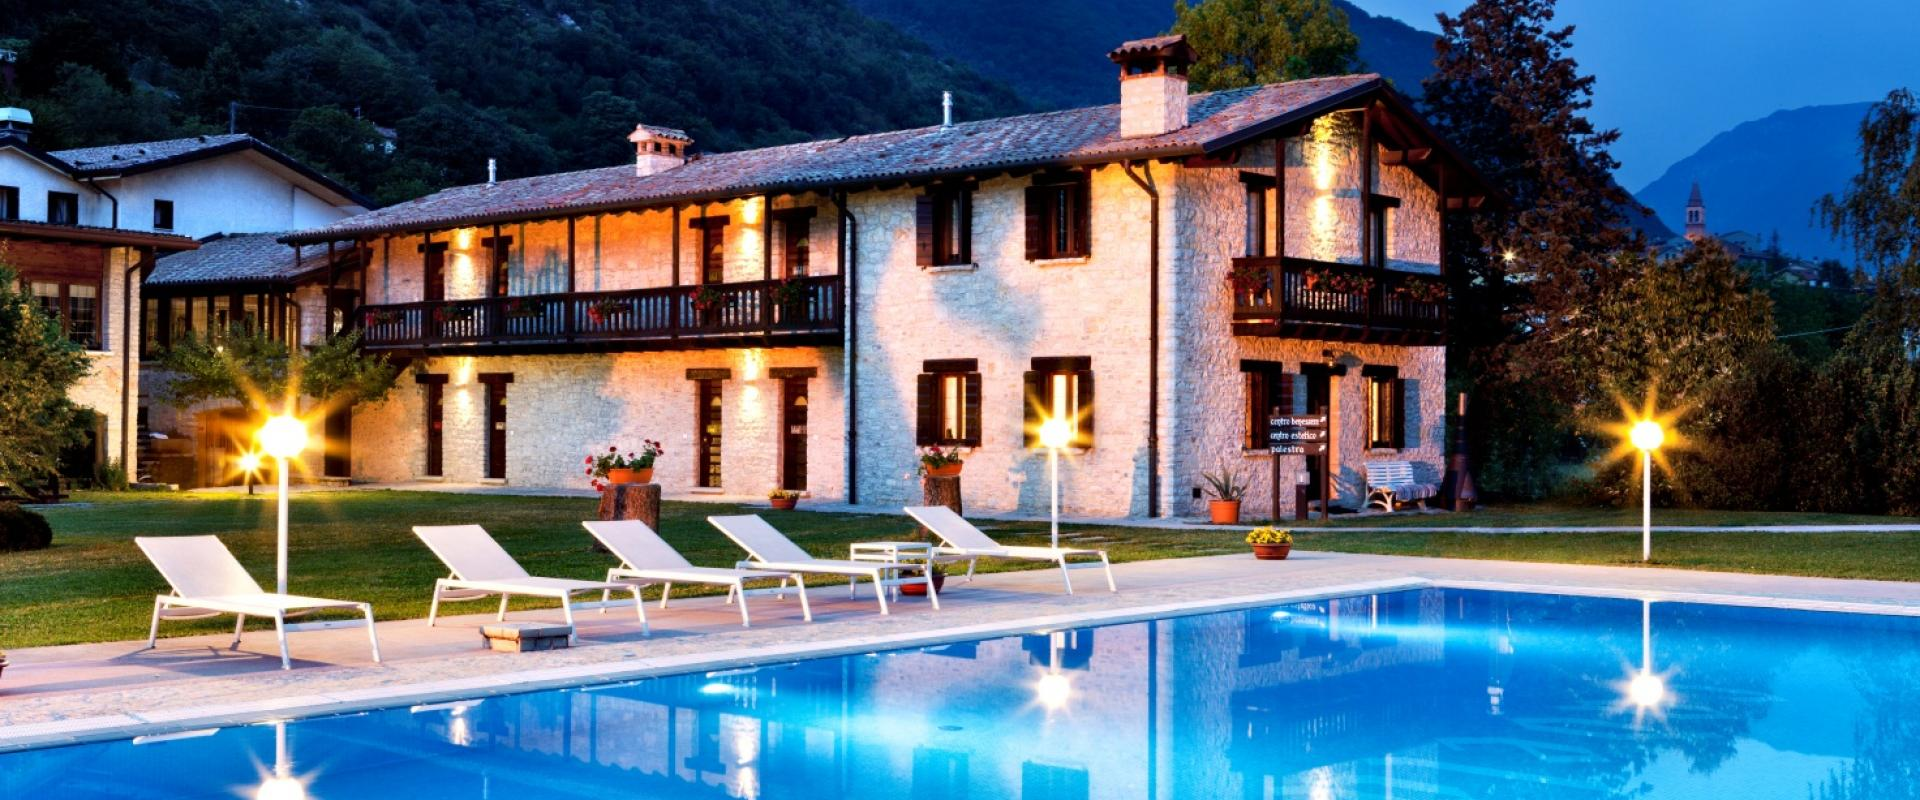 Hotel in Treviso area